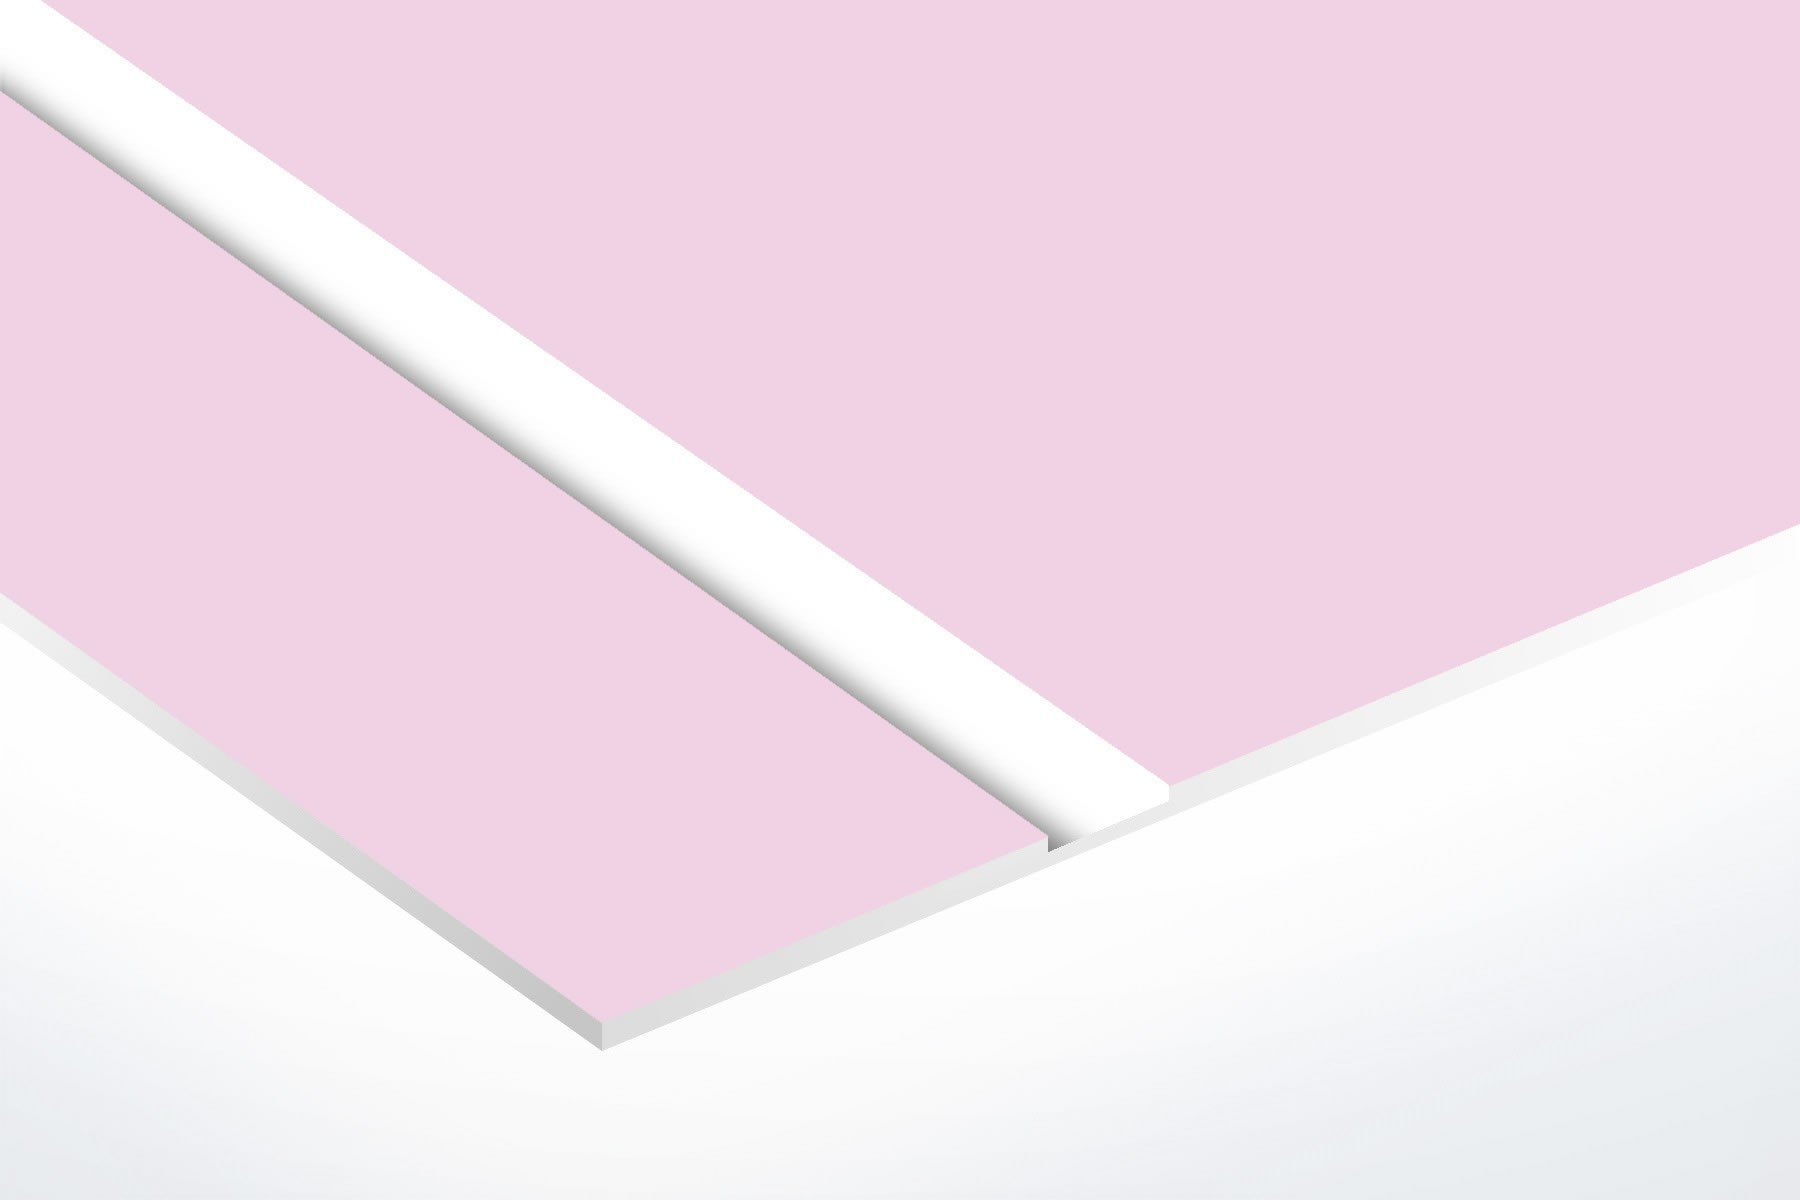 TroLase Lights,Blush Pink/White, 2ply, 0.1 mm